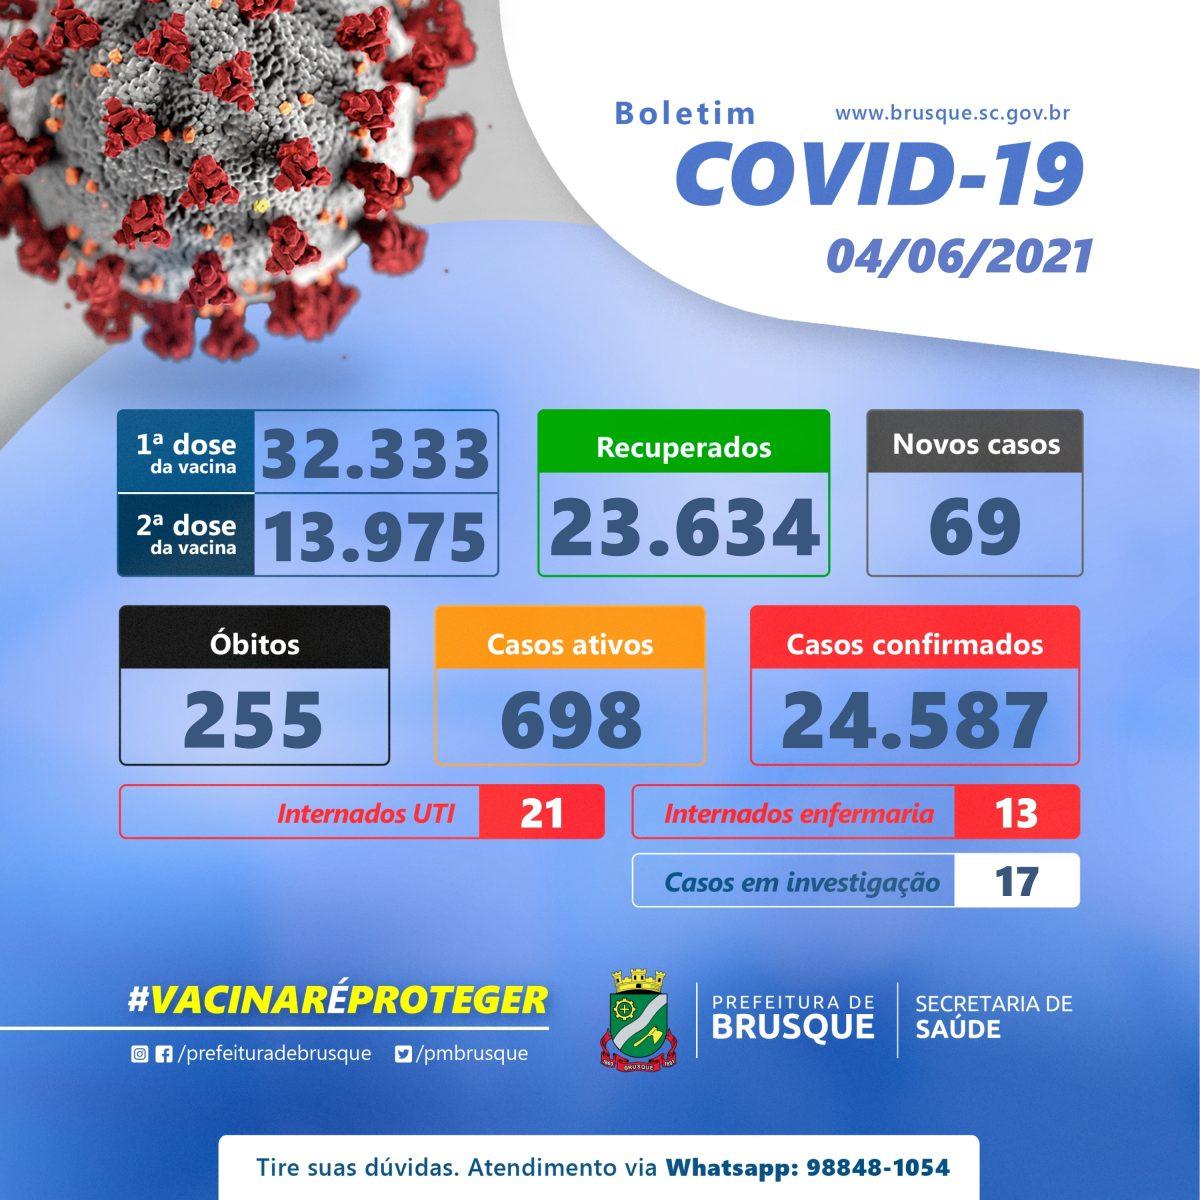 Covid-19: Confira o boletim epidemiológico desta sexta-feira (4)